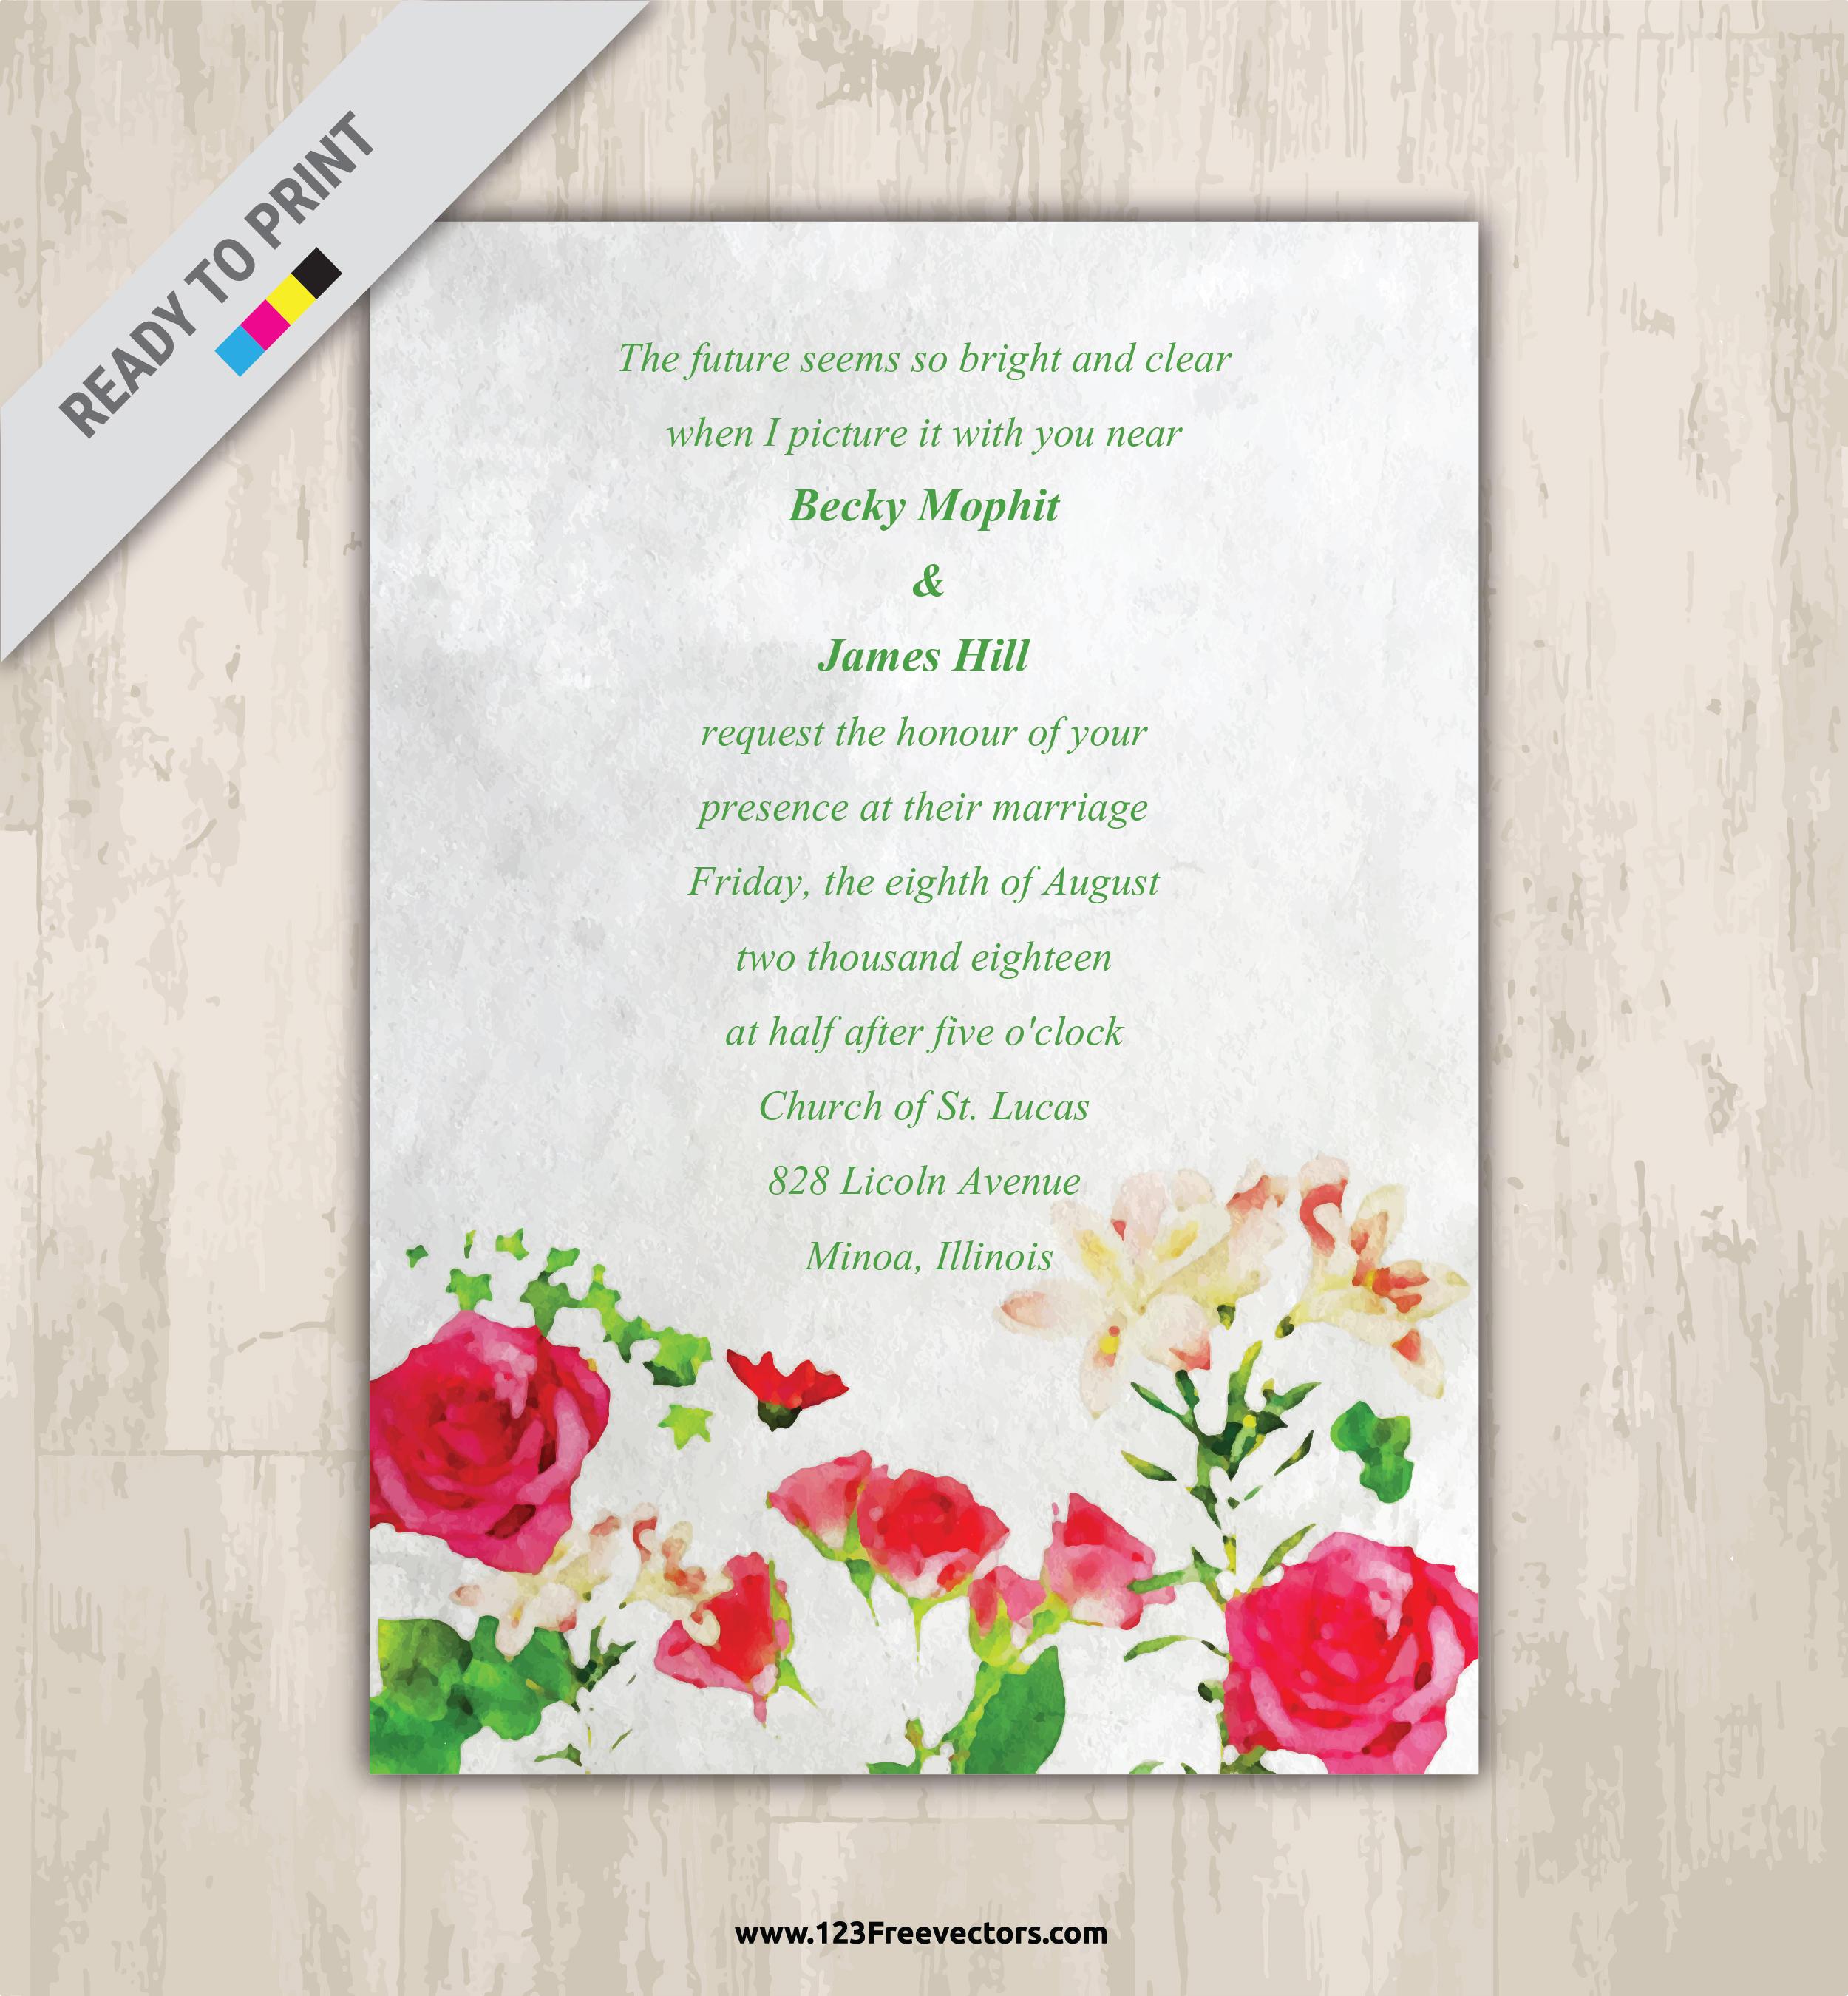 Watercolor Floral Wedding Invitation Vector Graphics | 123Freevectors